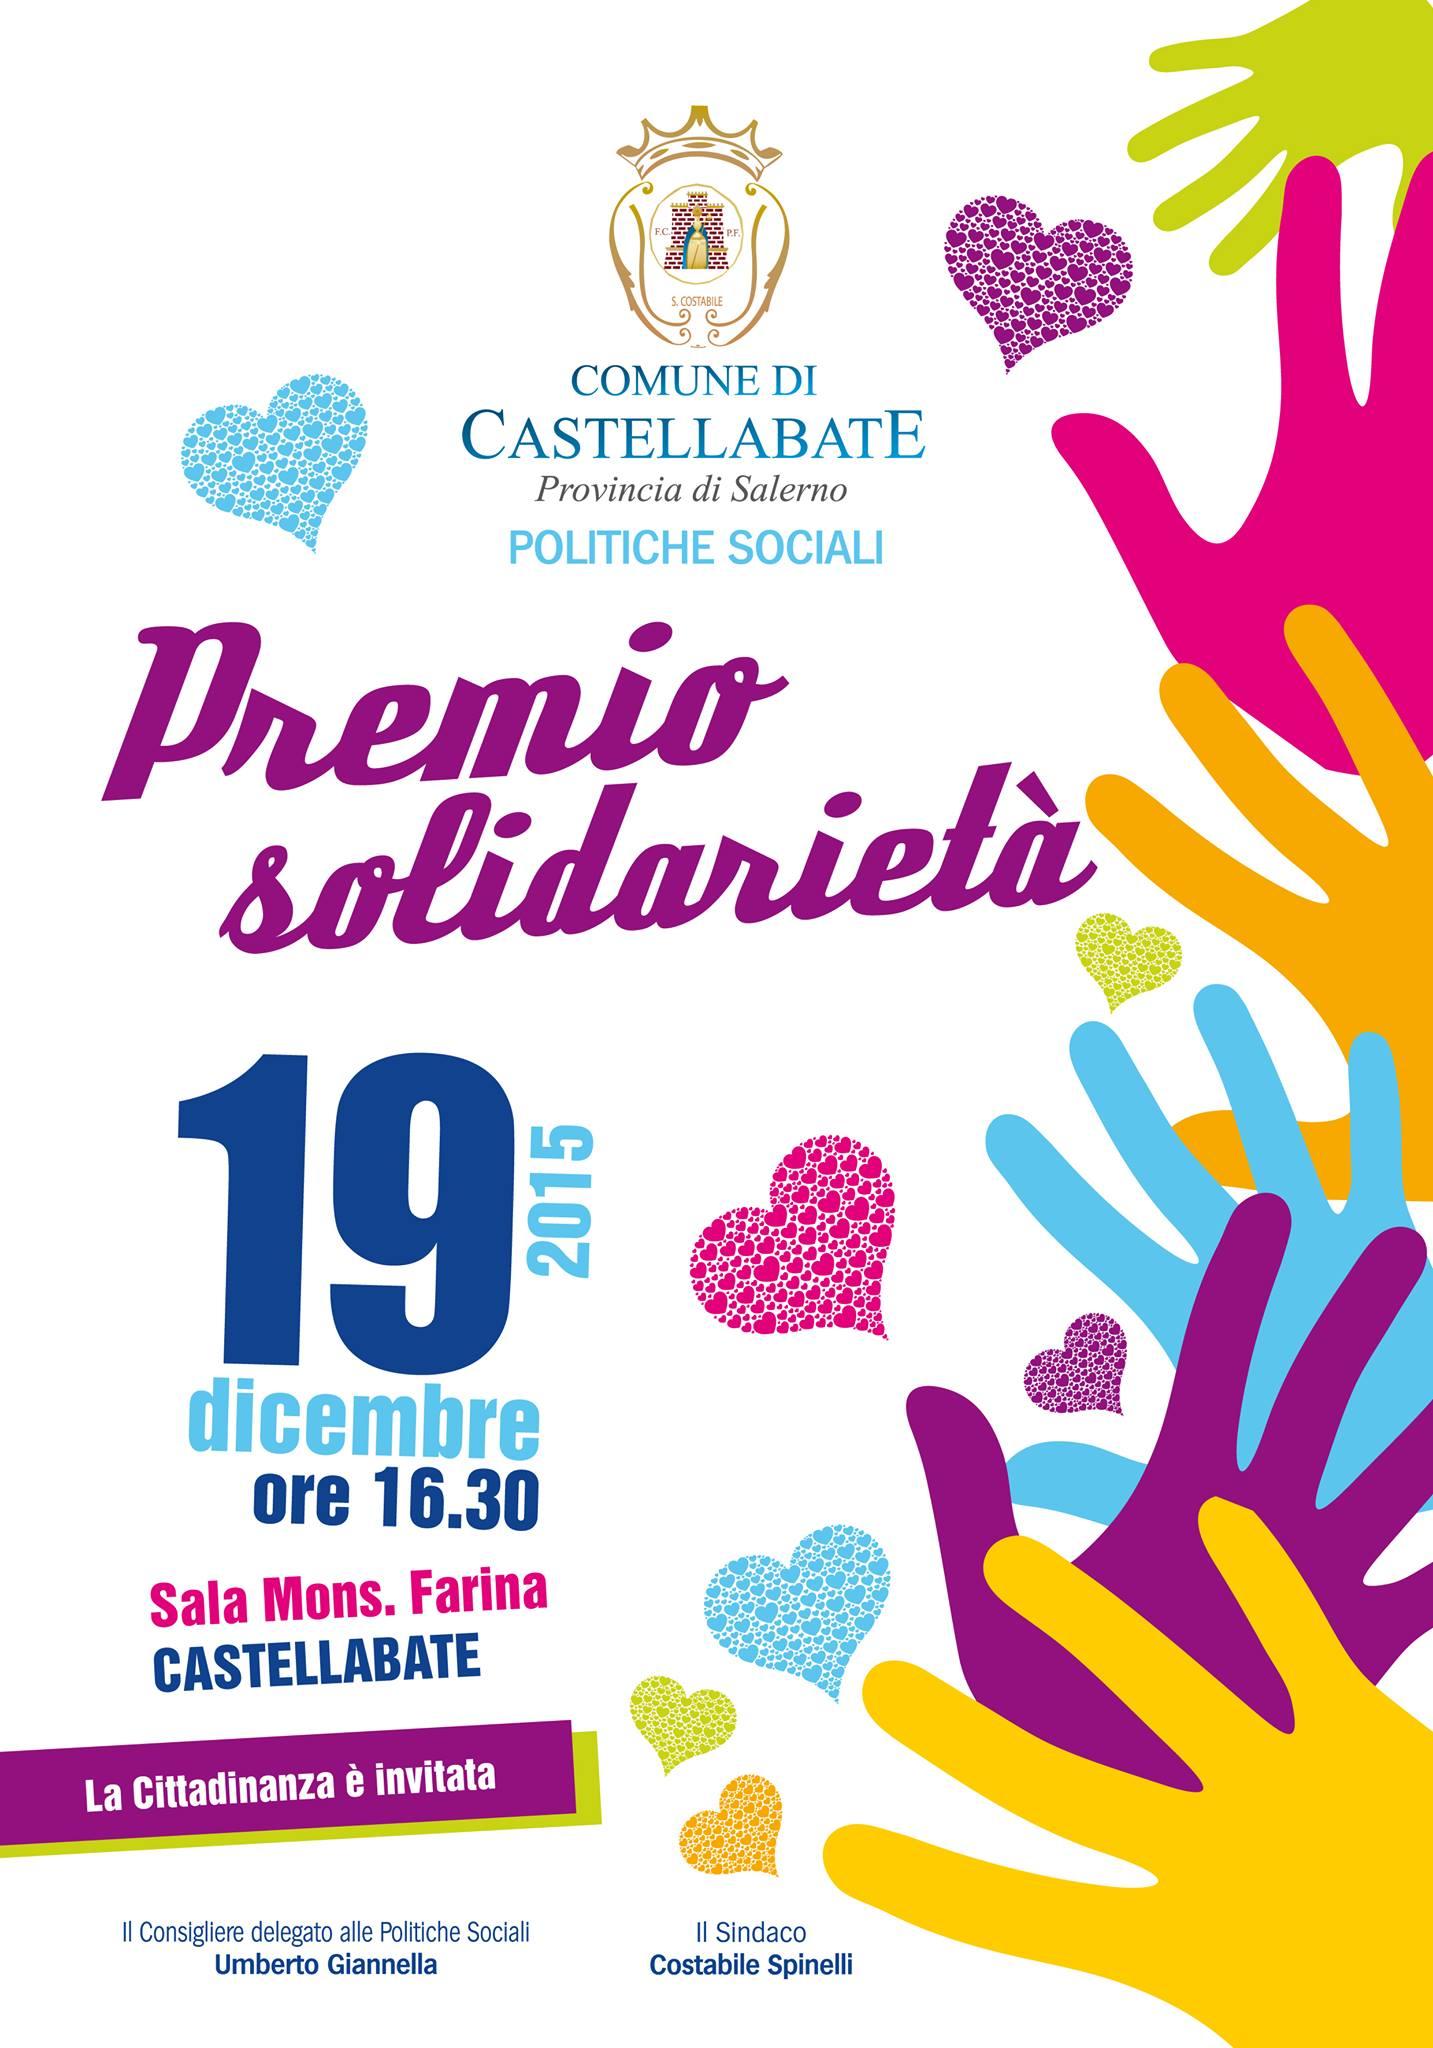 castellabate premio solidarietà 2015